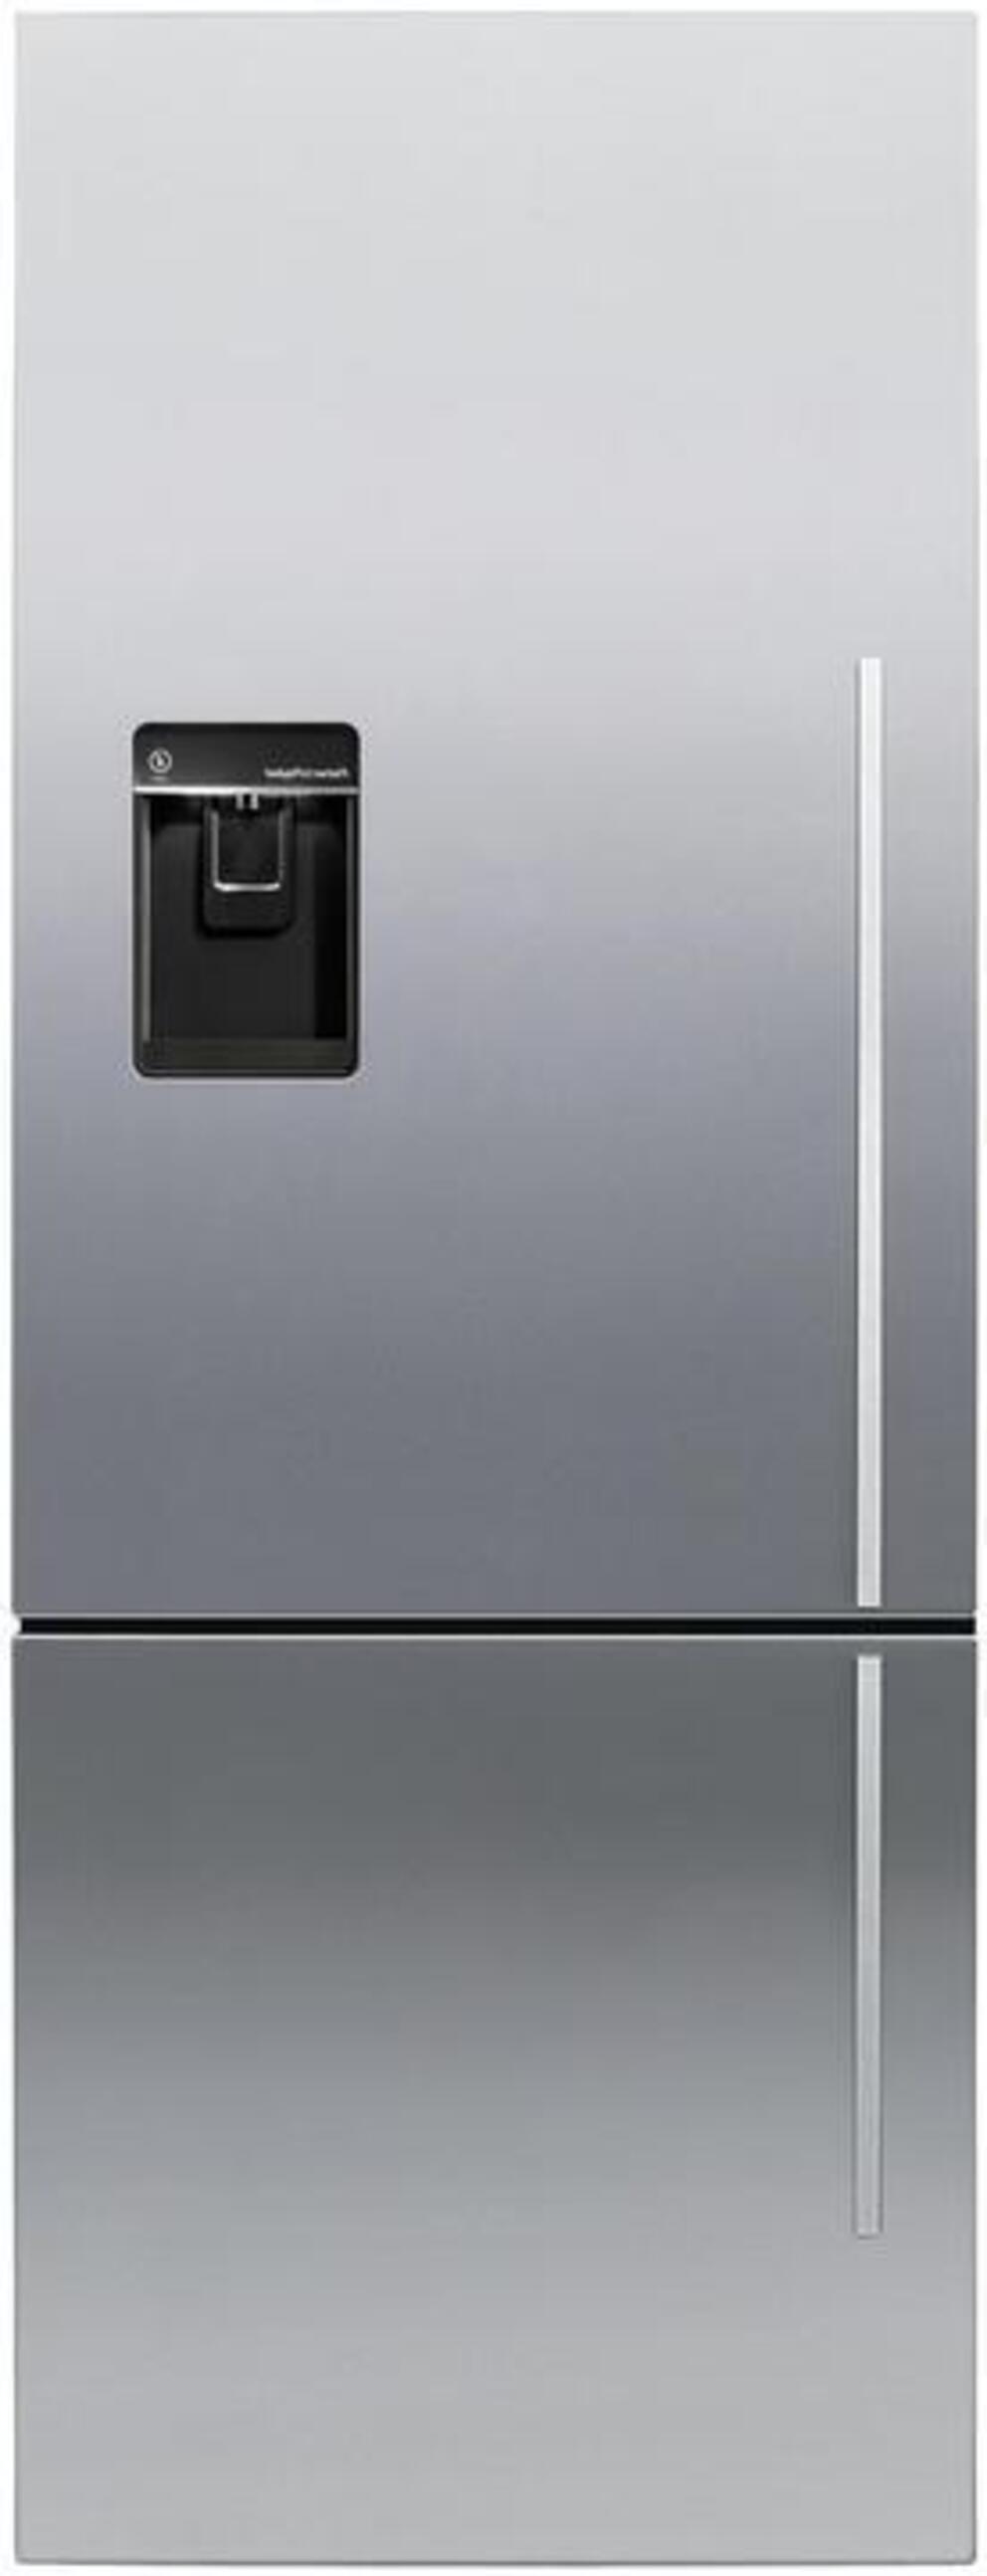 Fridges Fisheru0026Paykel RF135BDLUX4. Fisheru0026Paykel. Left Hinge Bottom Freezer  Refrigerator RF135BDLUX4 · Fridges Fisheru0026Paykel RF135BDLX4